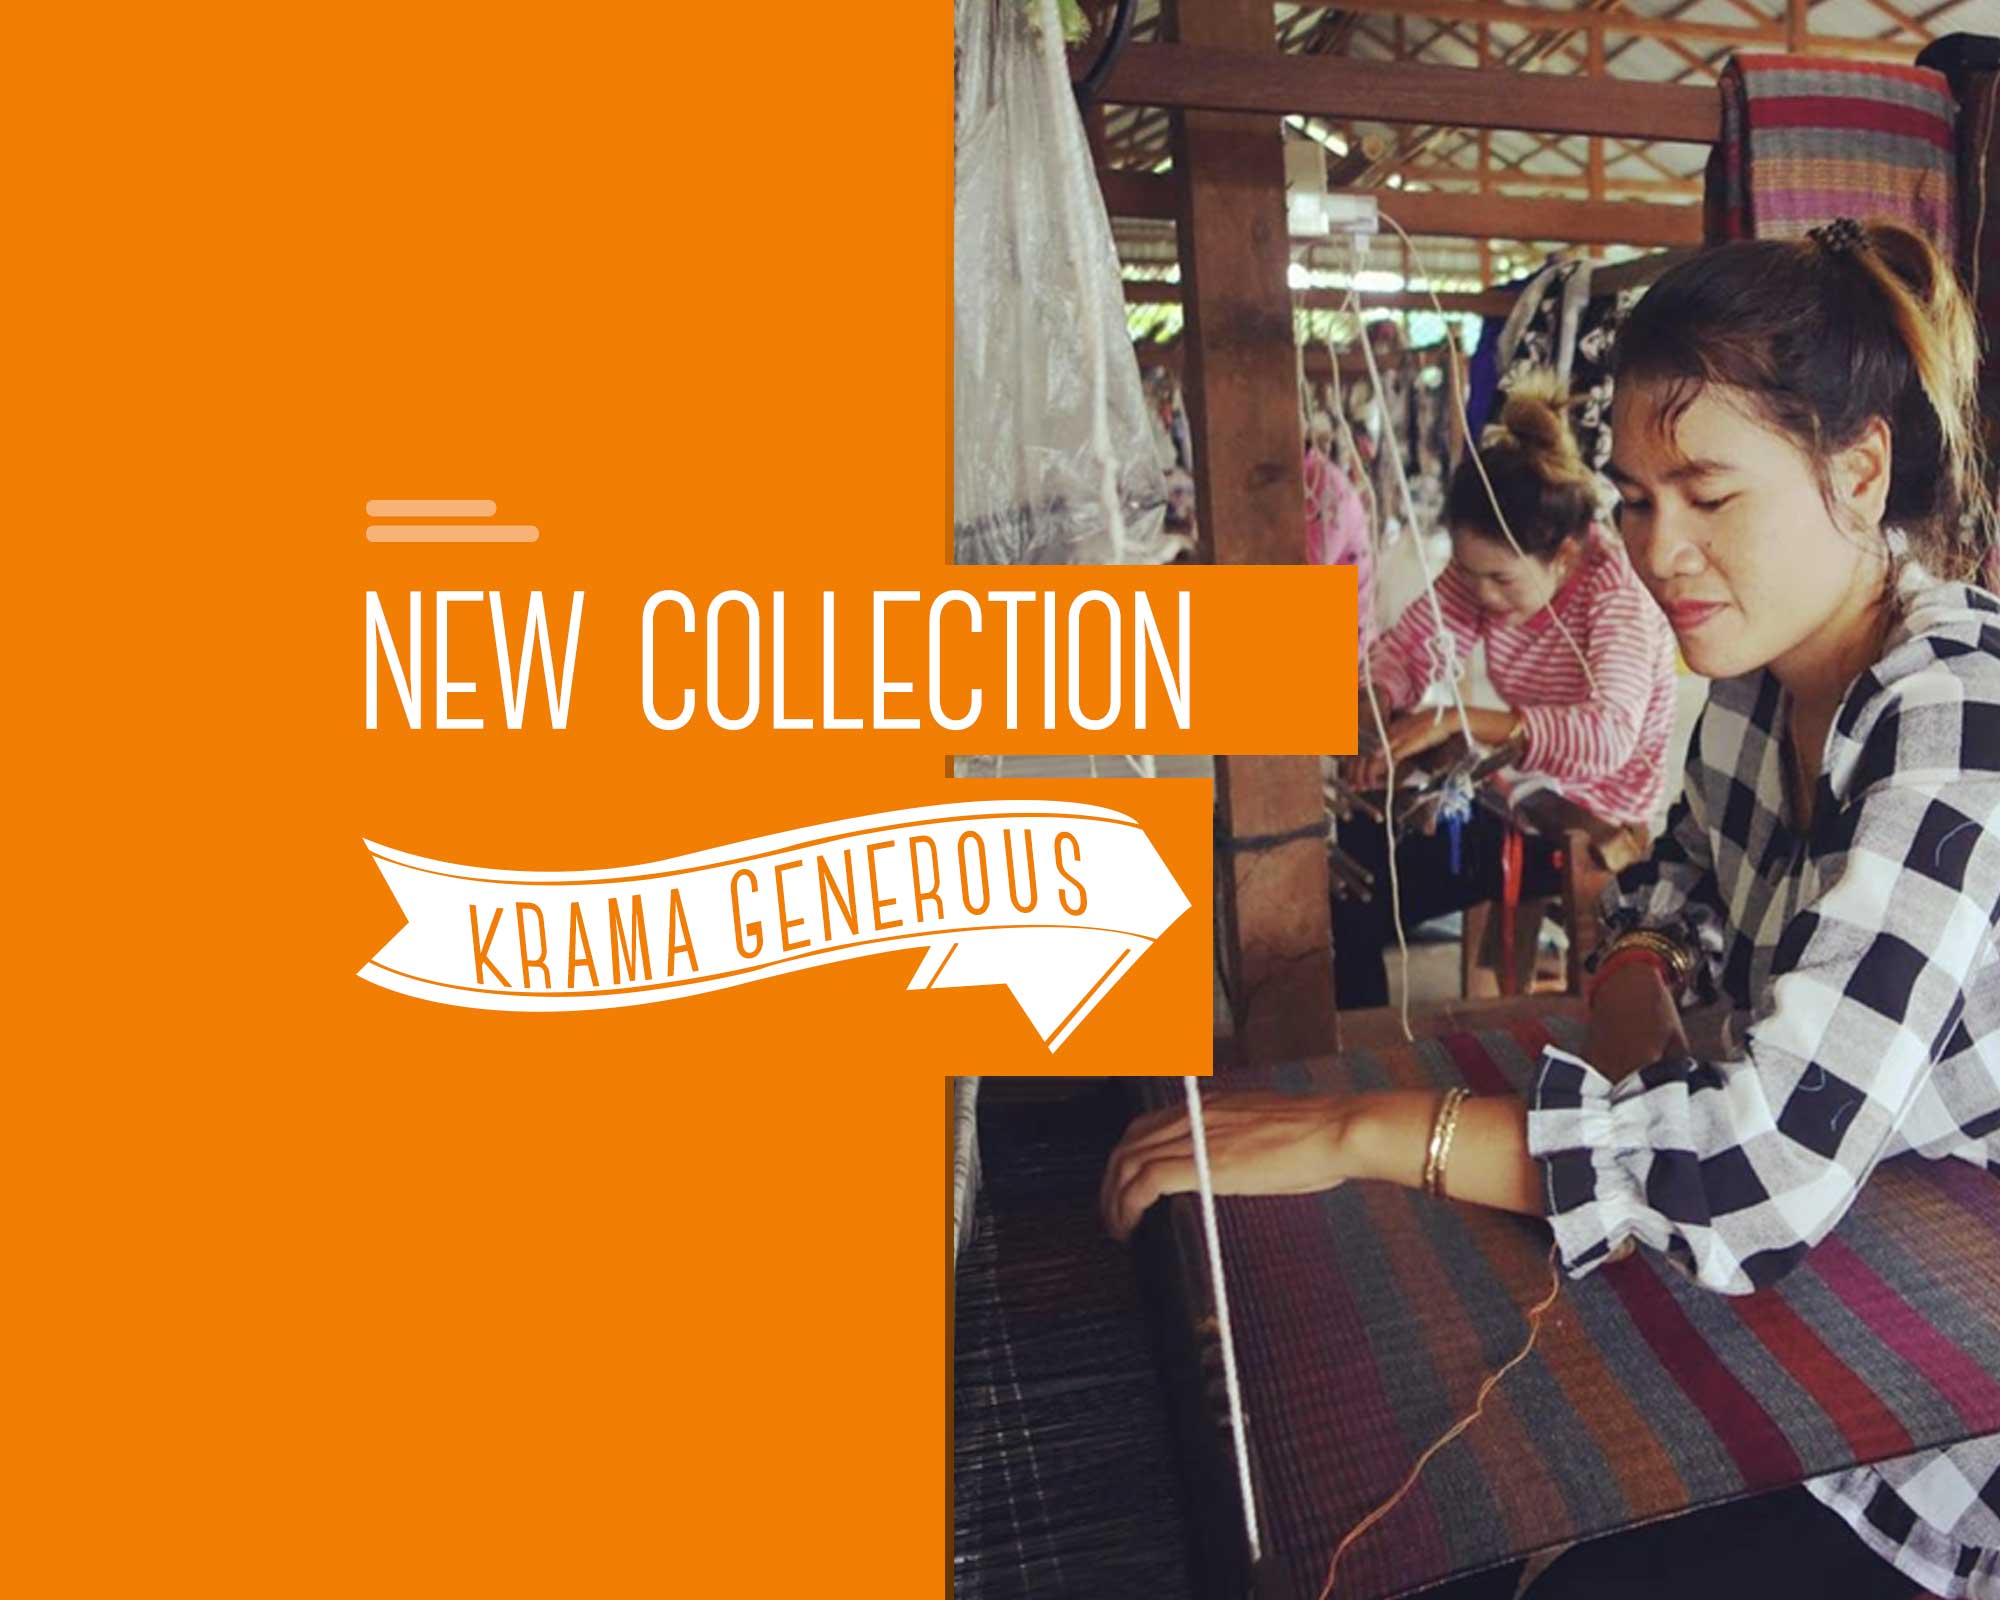 collection krama generous